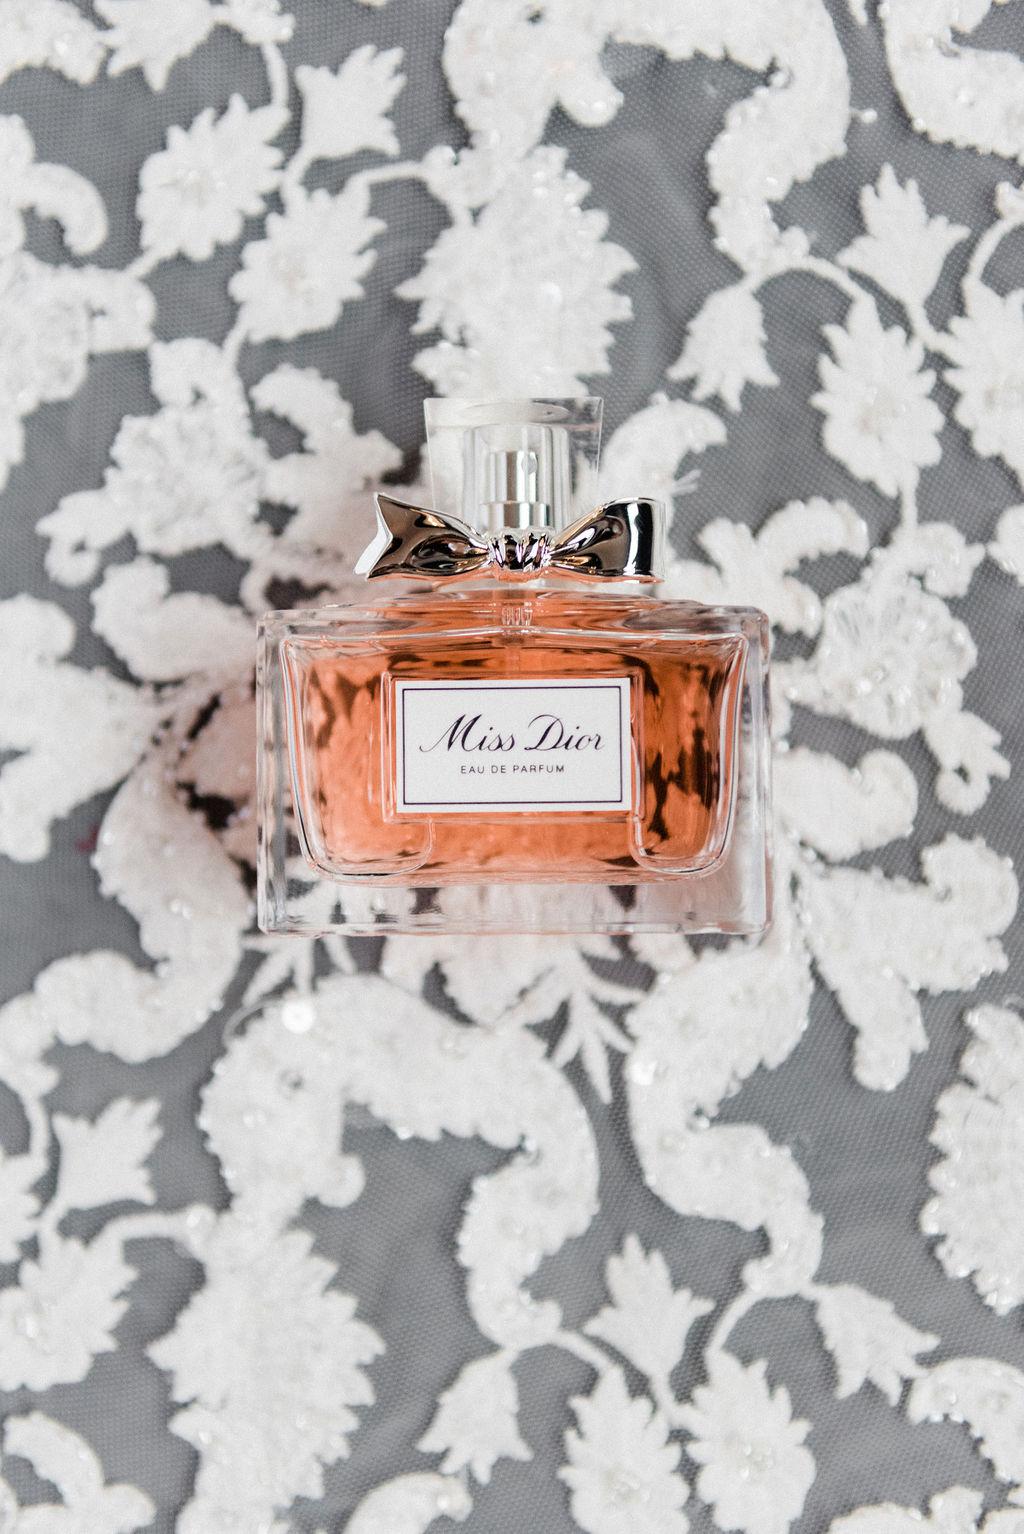 A bride's perfume